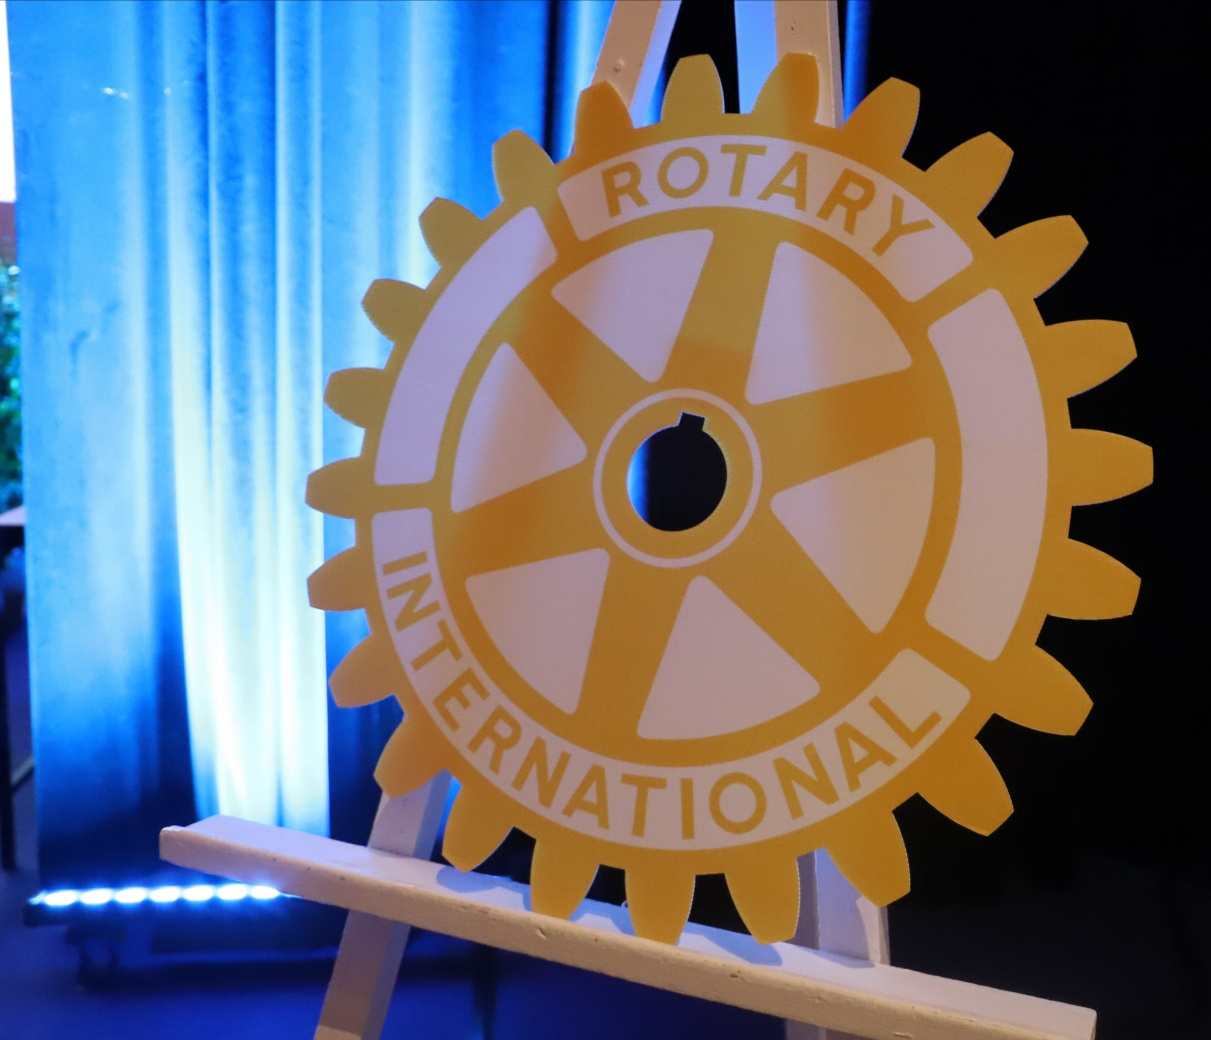 AG du Rotary district 1520